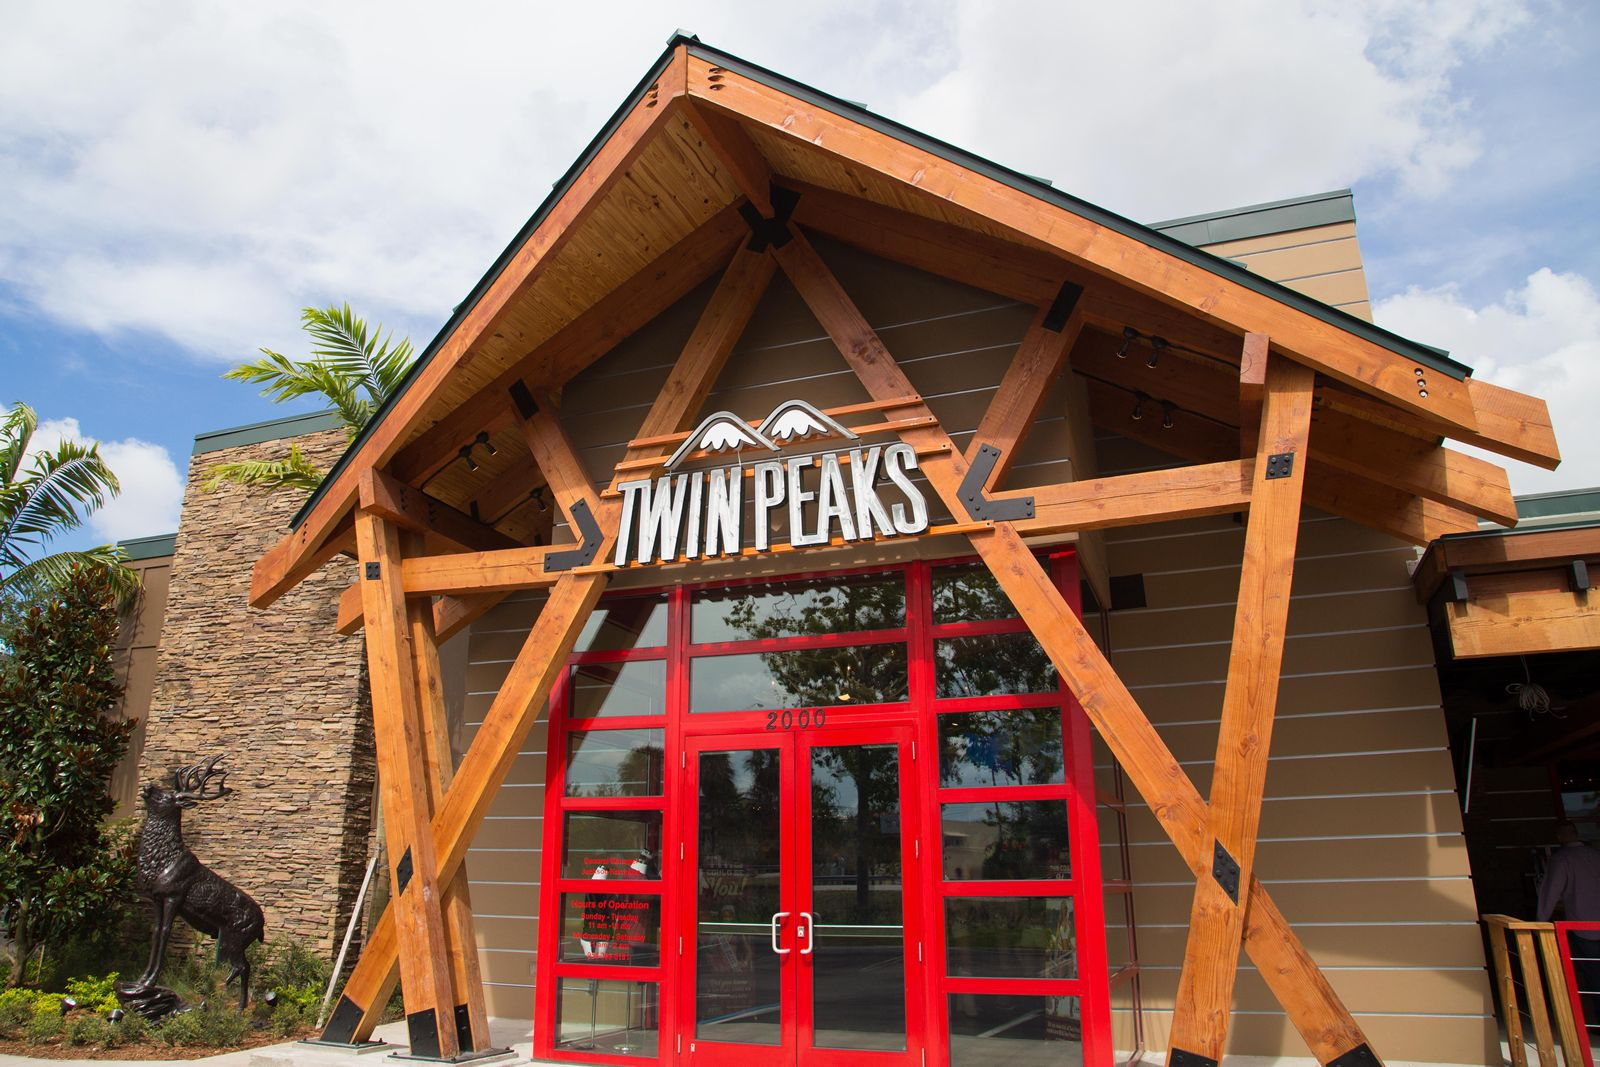 Twin Peaks Dayton Ohio